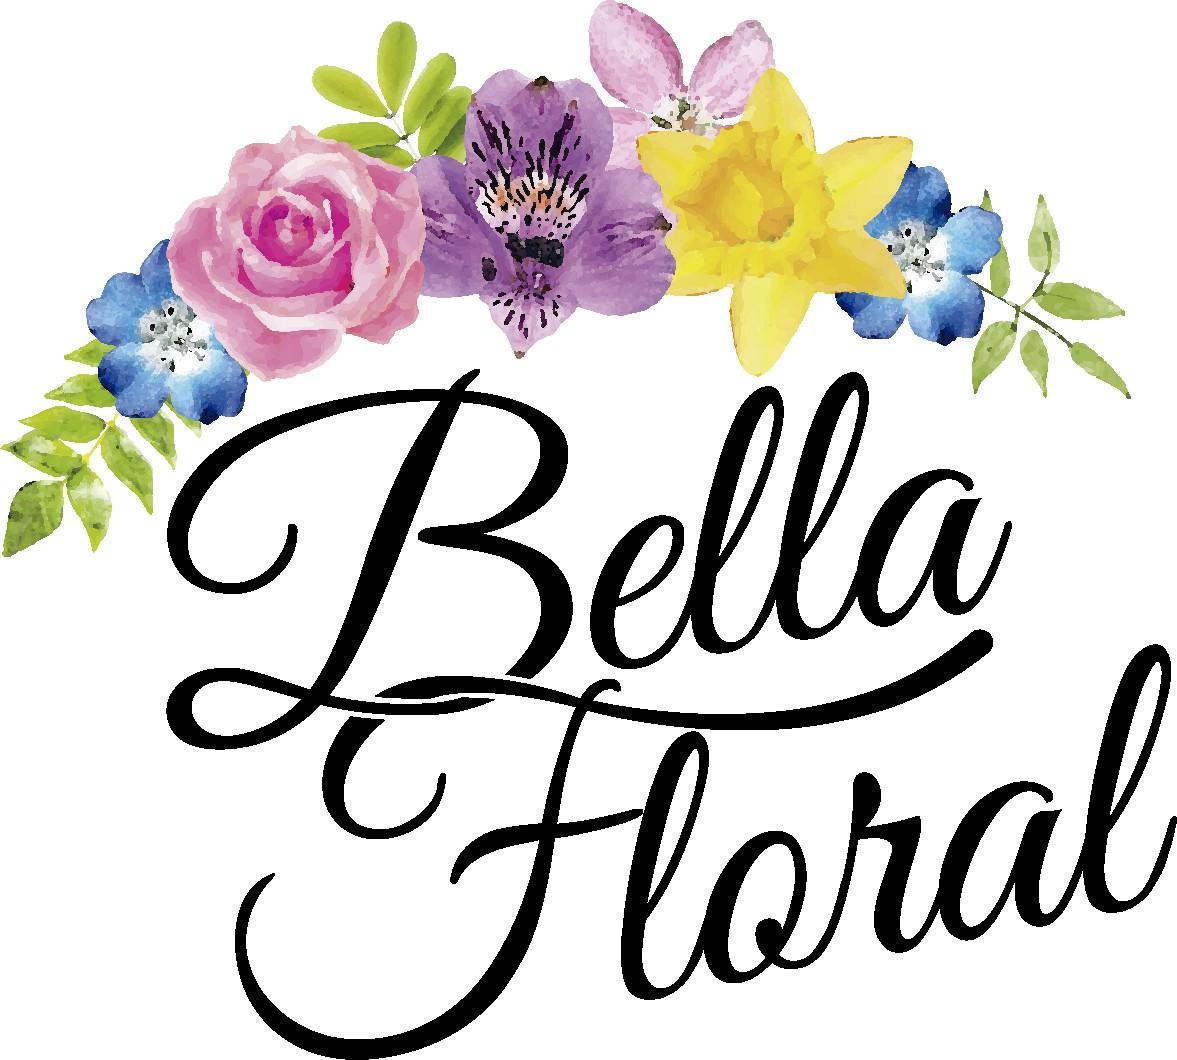 New Florist Needs a Bold Logo